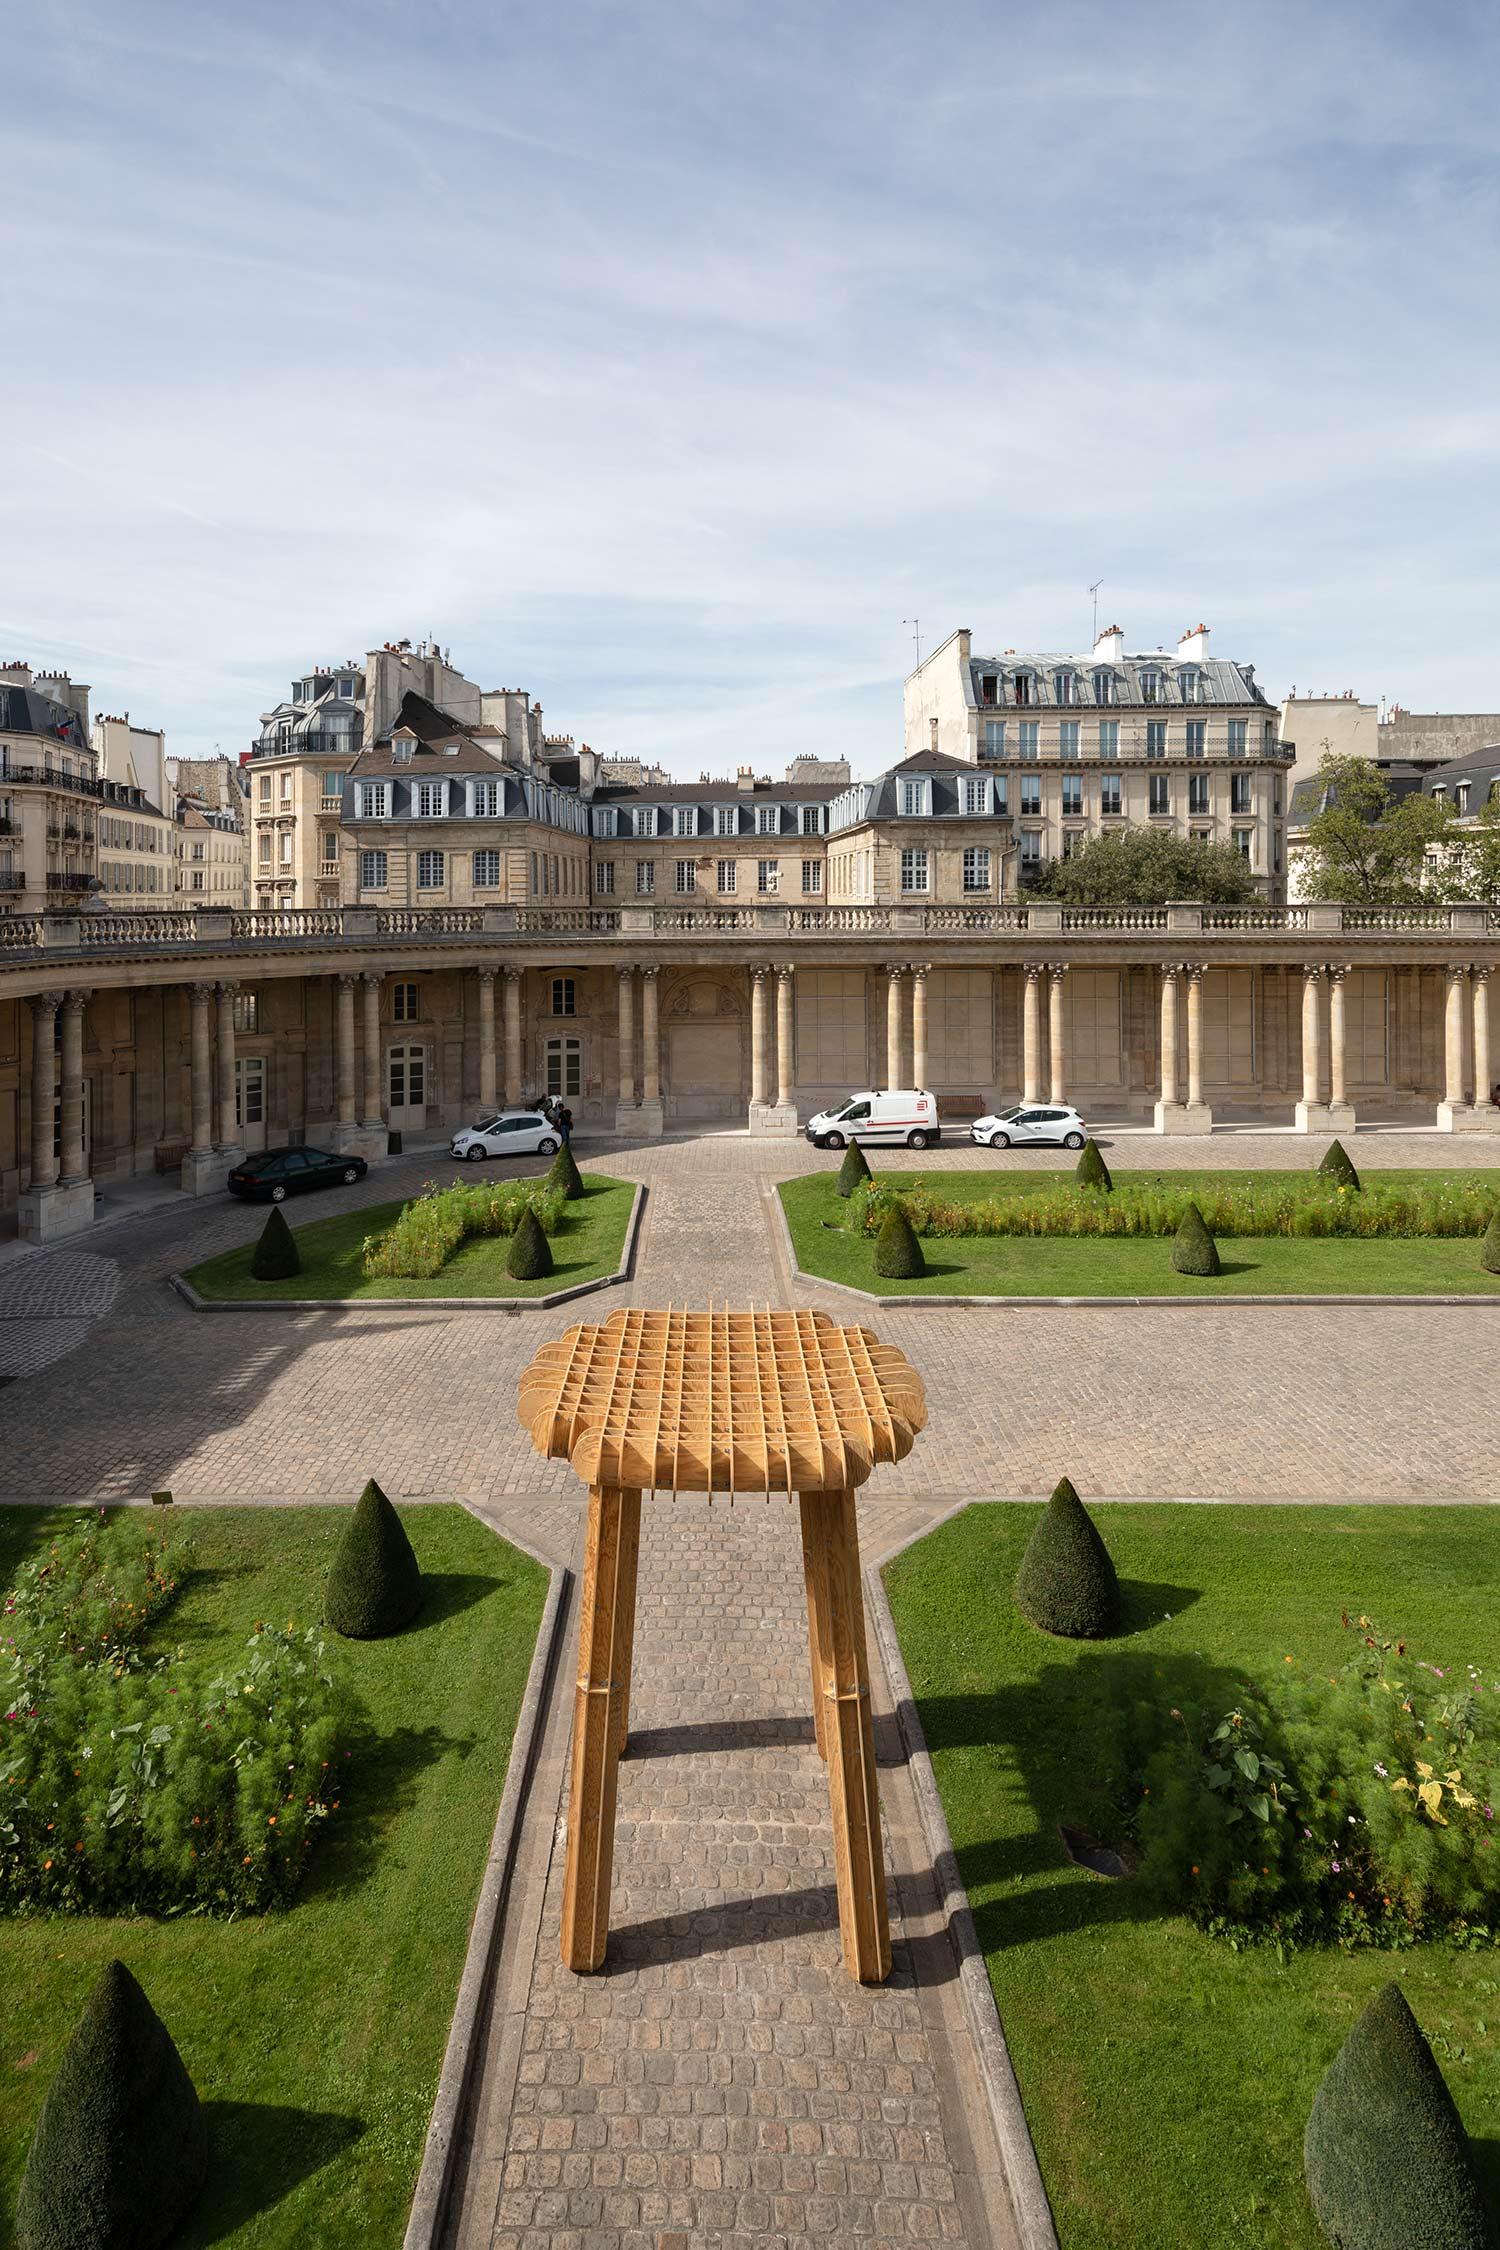 ublik-i-am-a-stool-pdw-2019-paris-design-week-installation